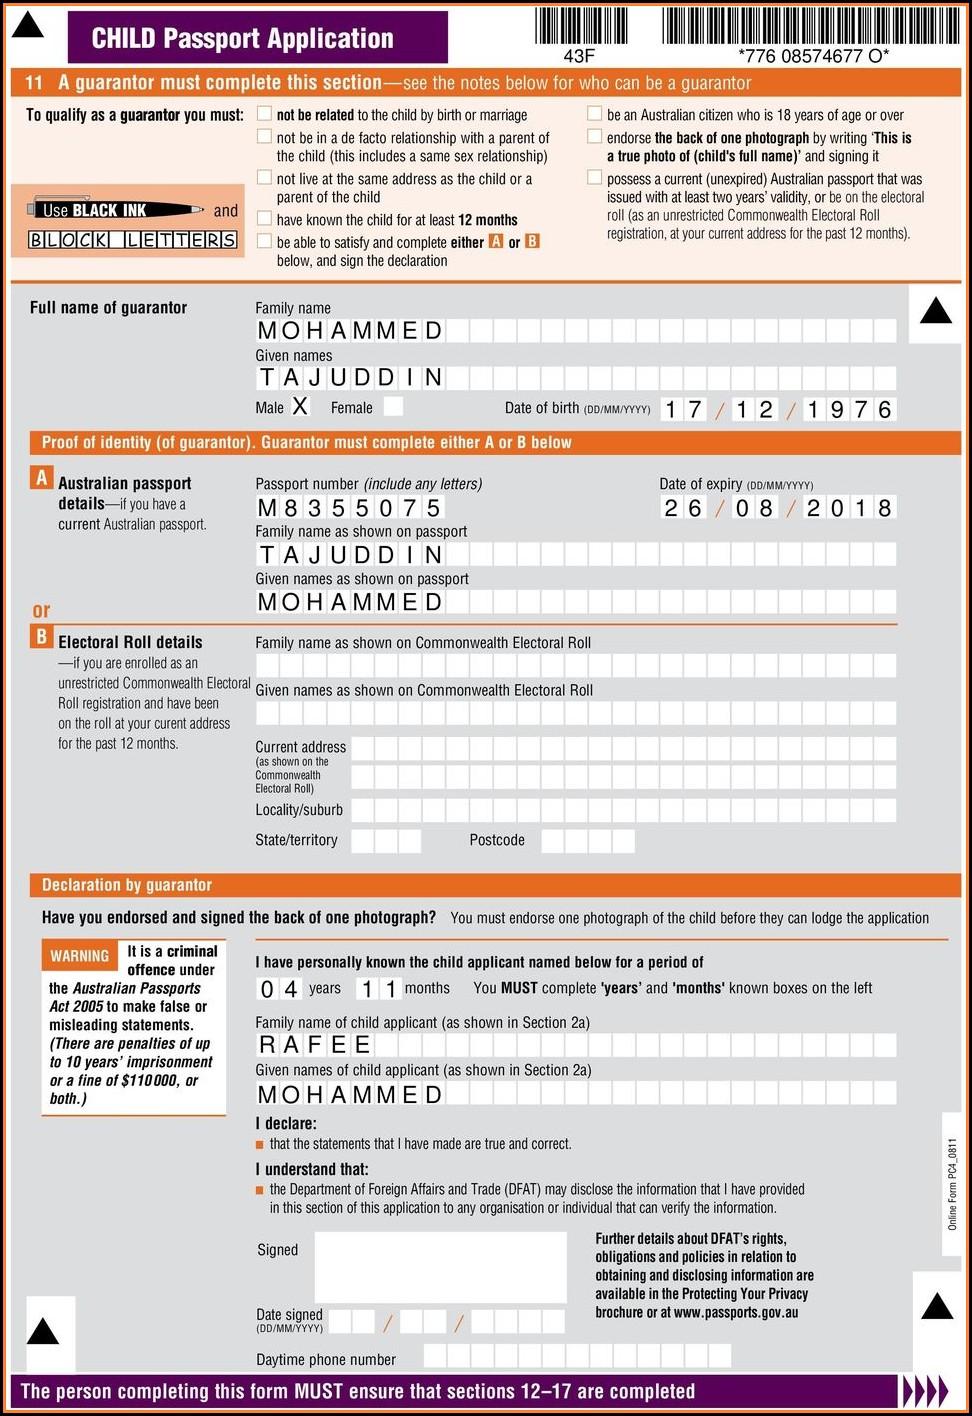 Online Form To Renew Australian Passport